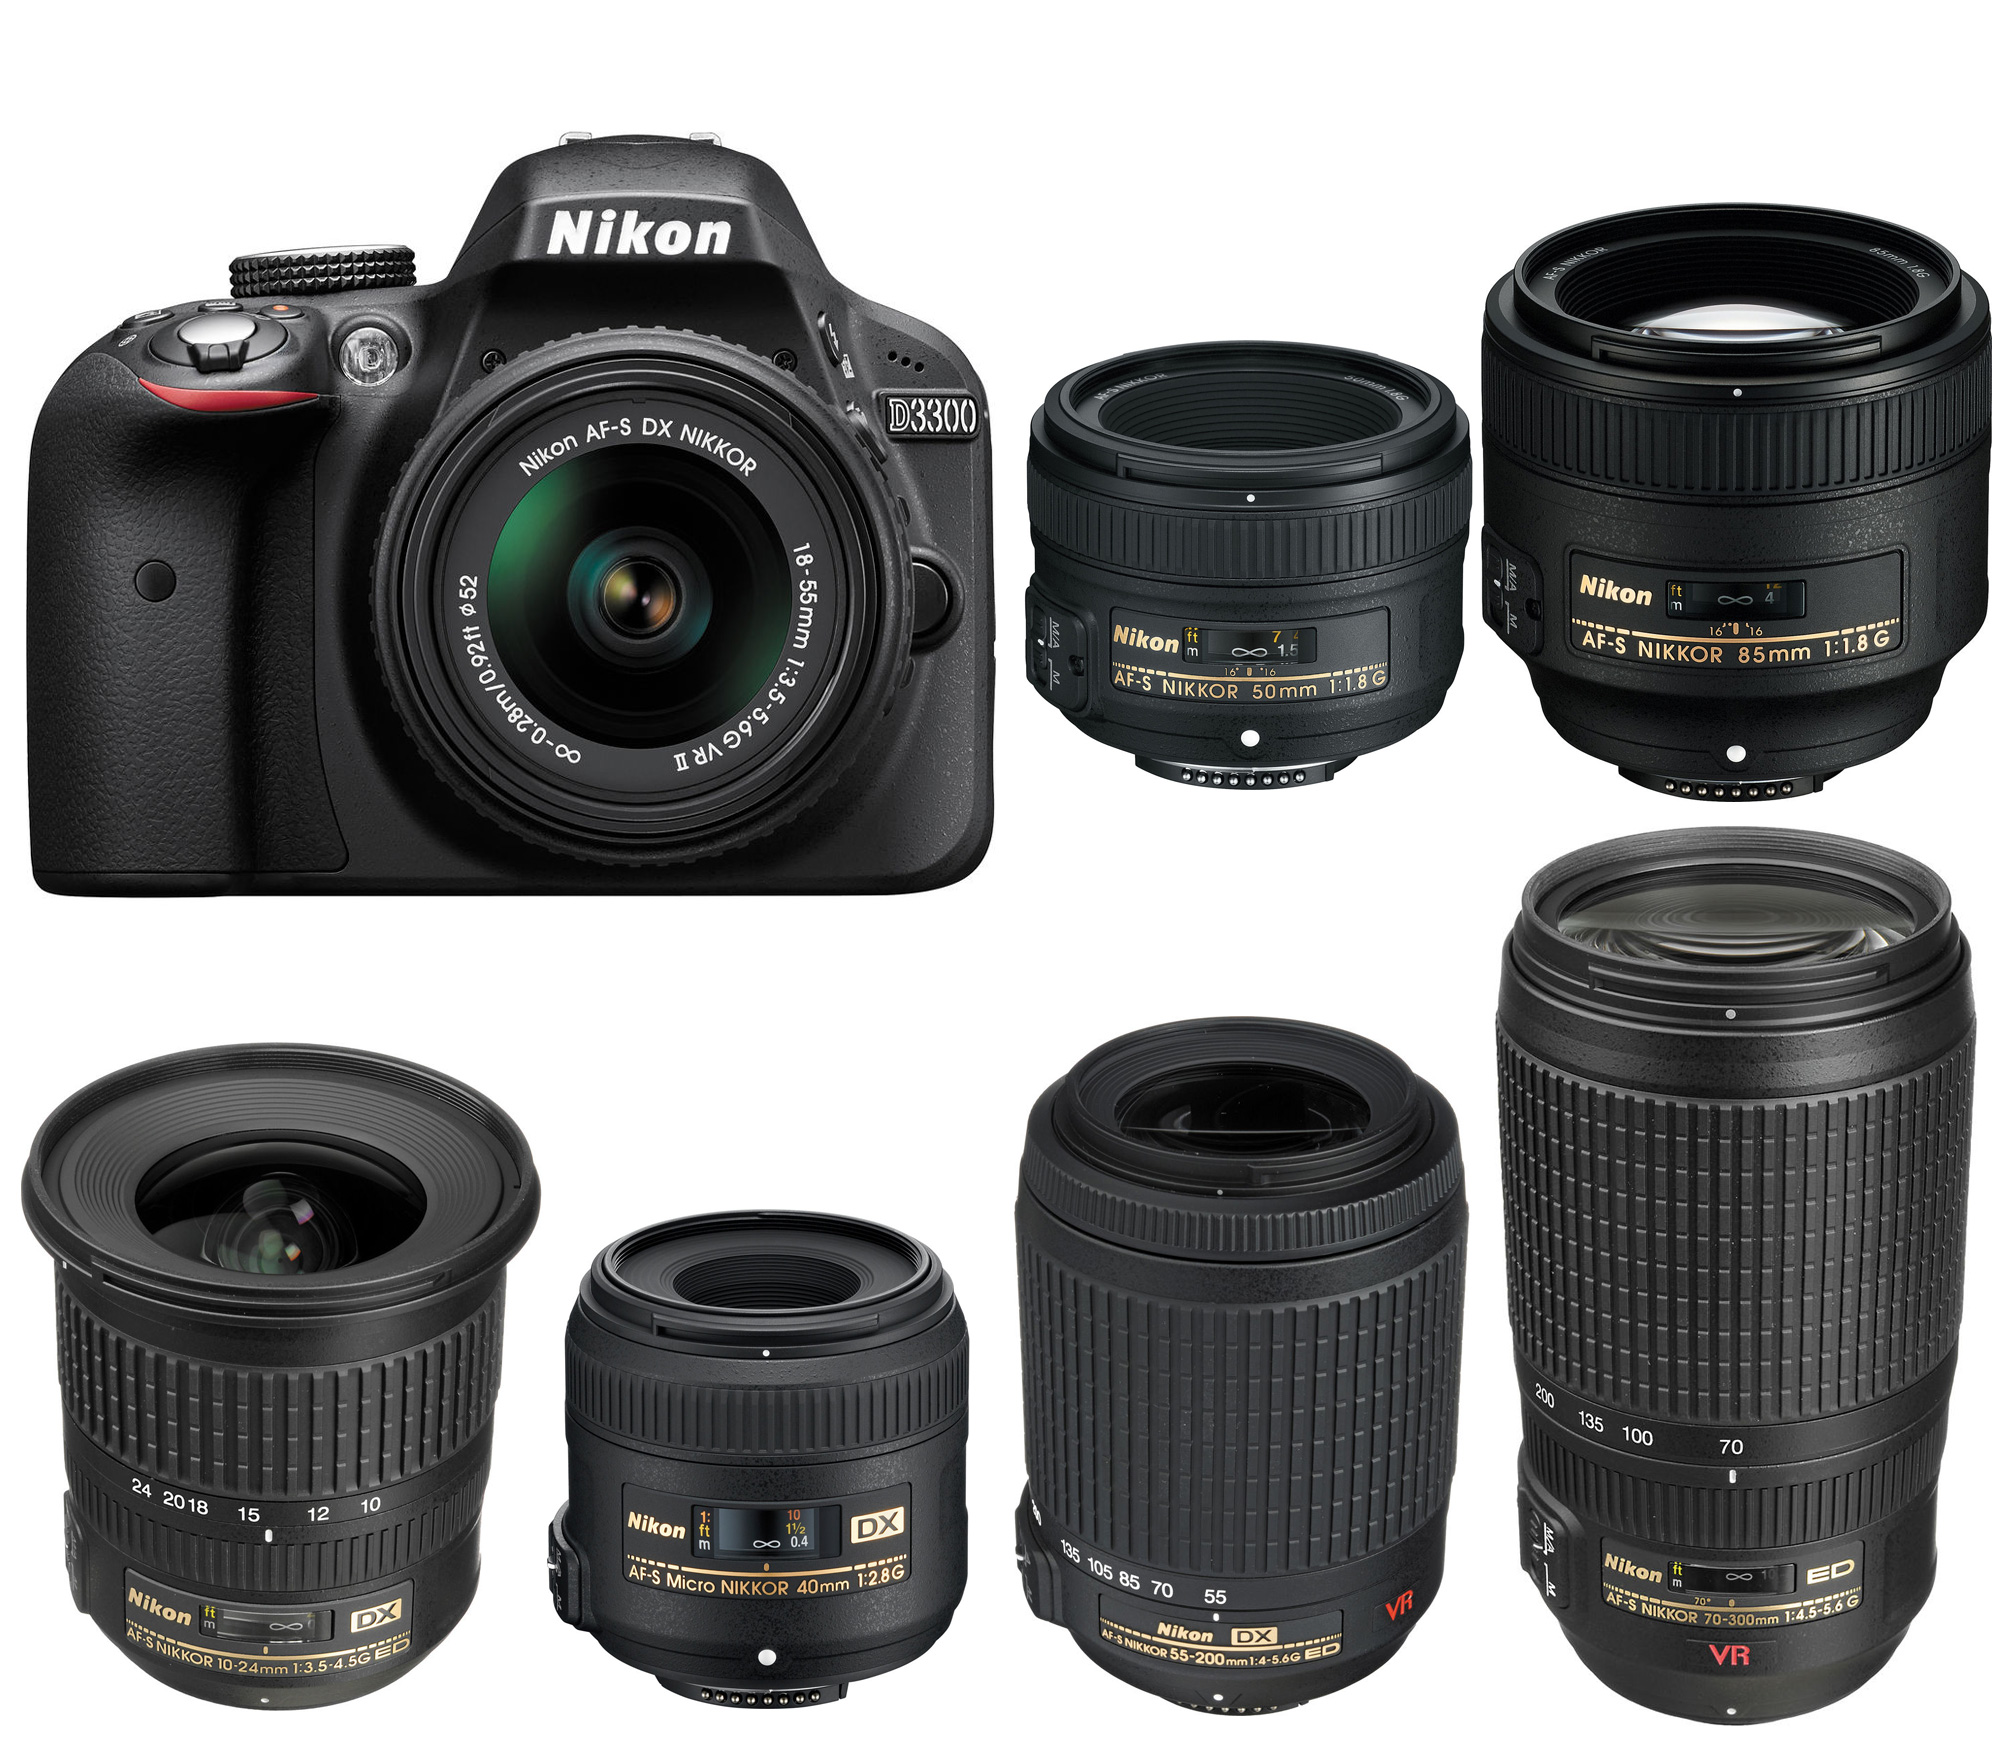 Camera Newest Dslr Cameras 2014 nikon d3300 camera news at cameraegg best lenses for d3300